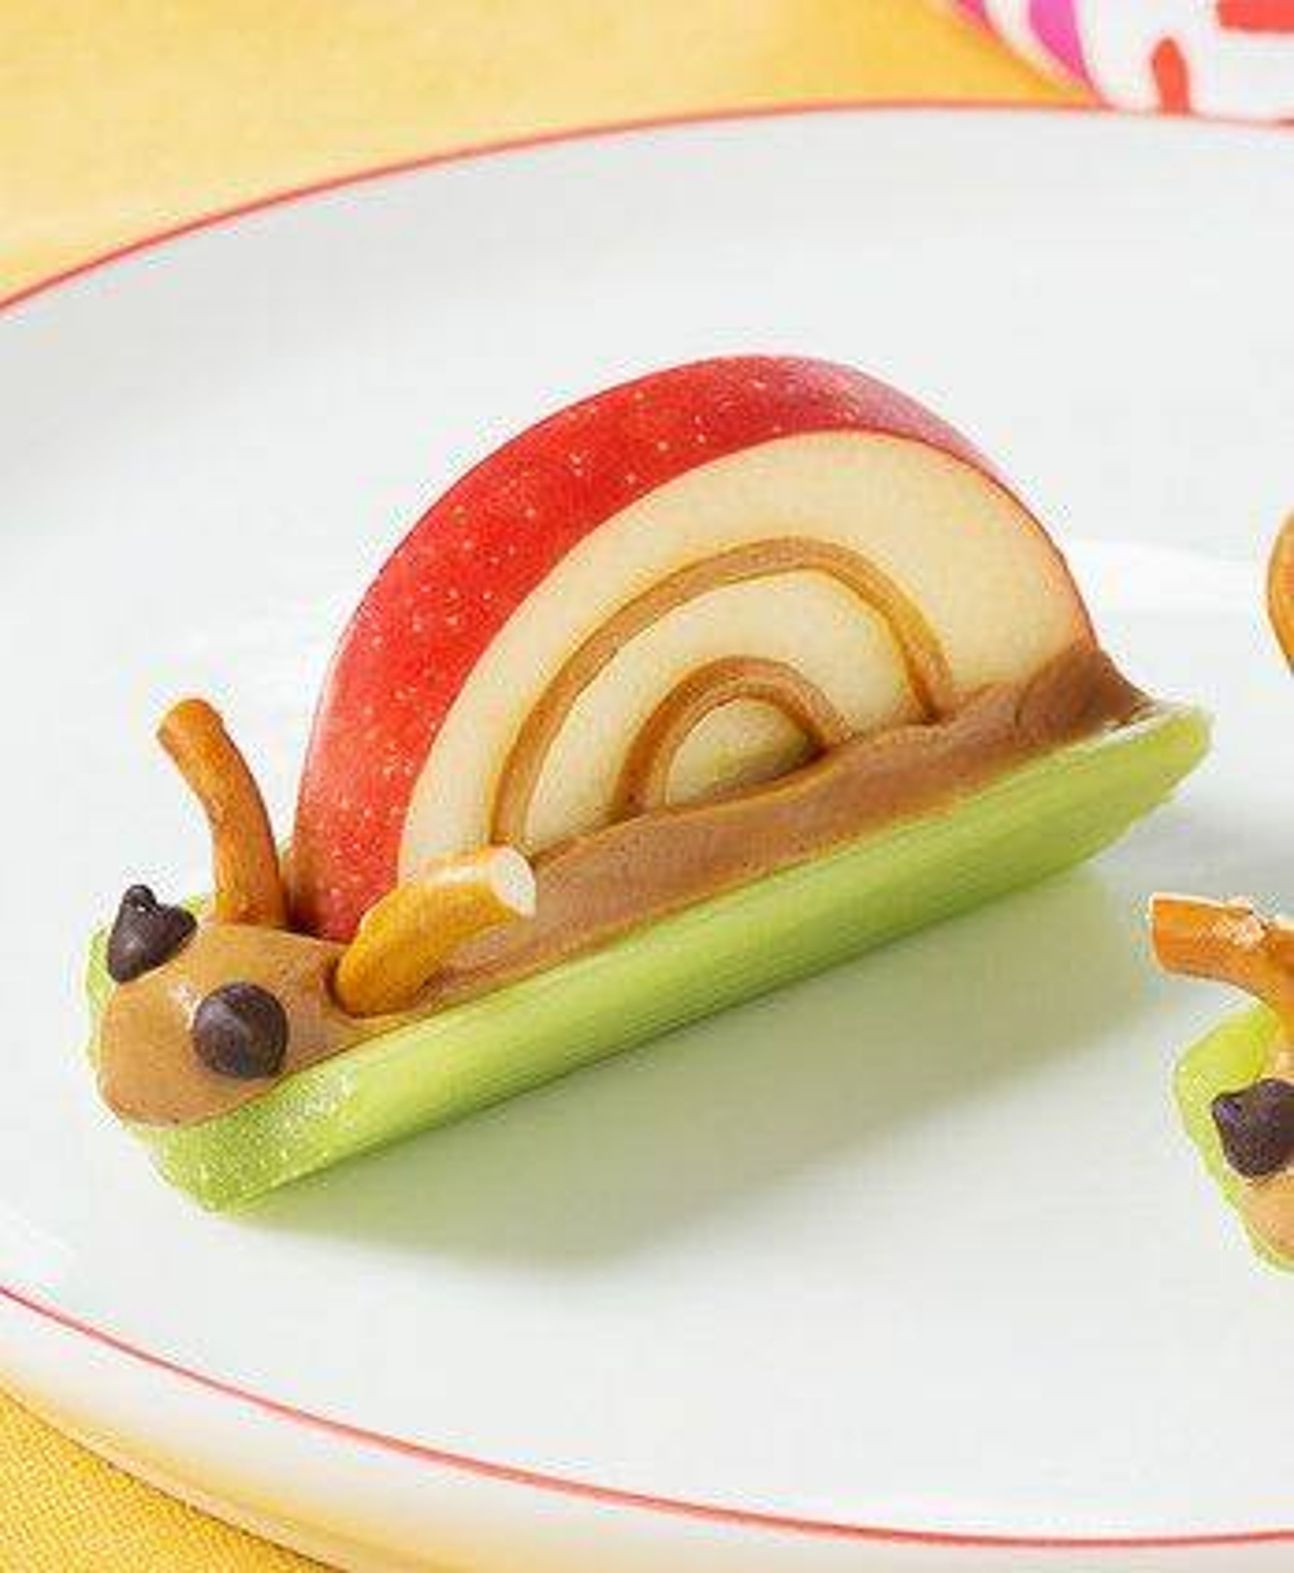 Cute Healthy Snacks  Caterpillar snack Celery apple peanut butter pretzel